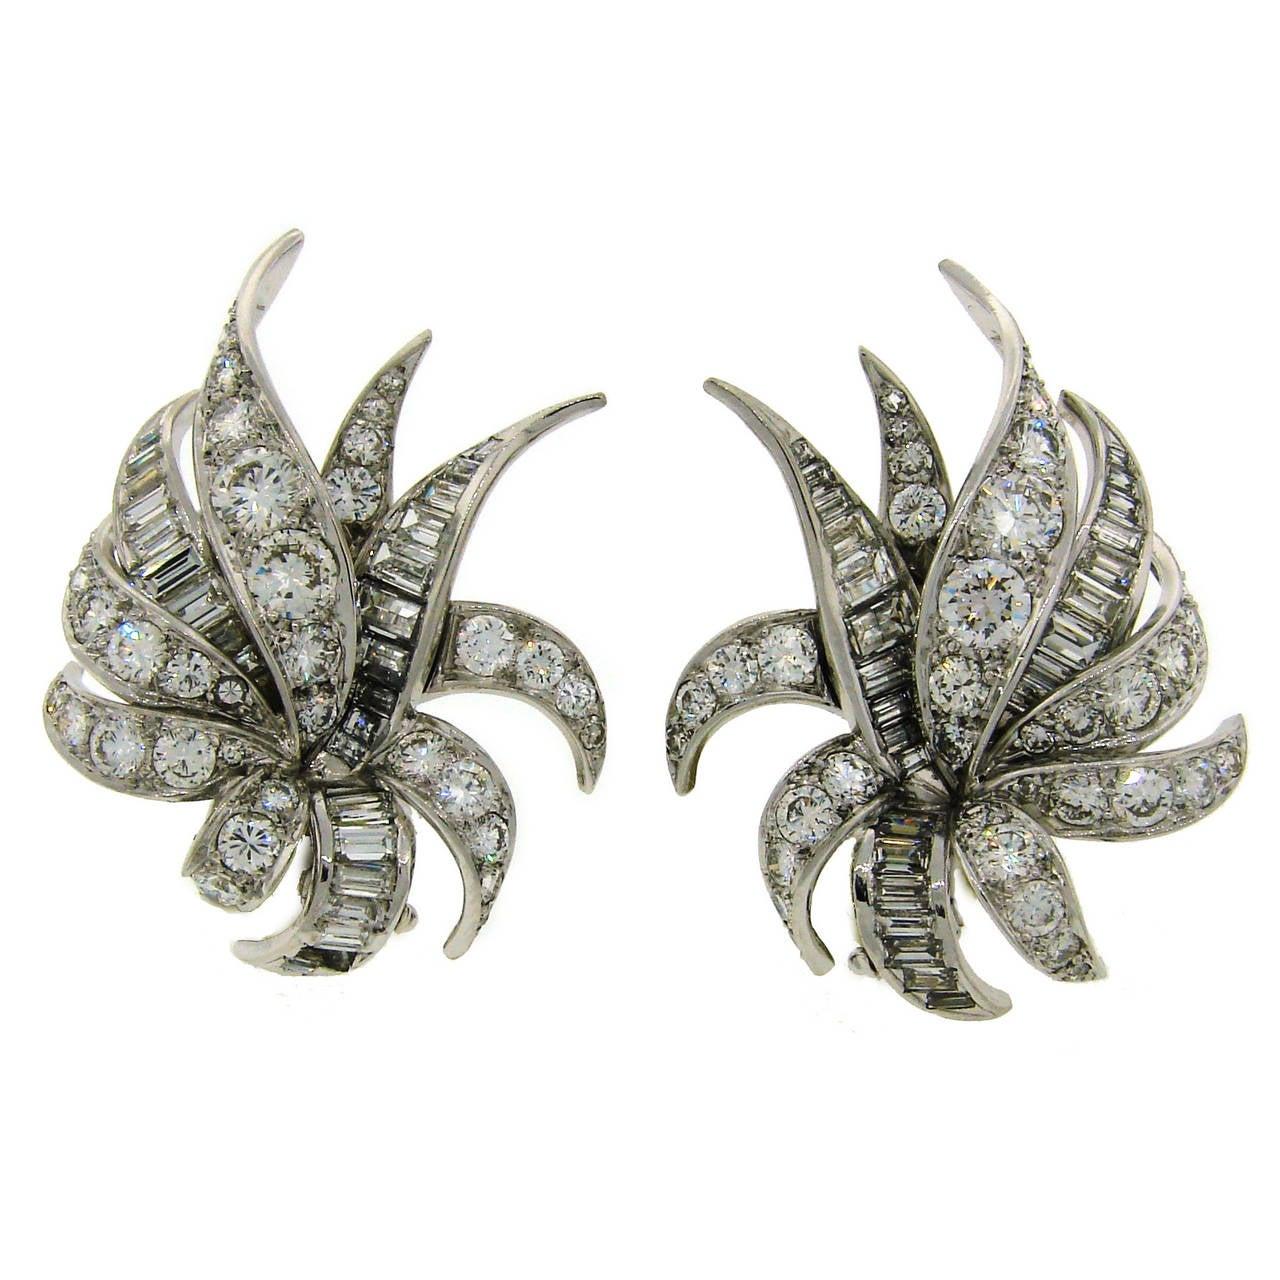 1930s Chaumet Paris Diamond Platinum Earrings 1